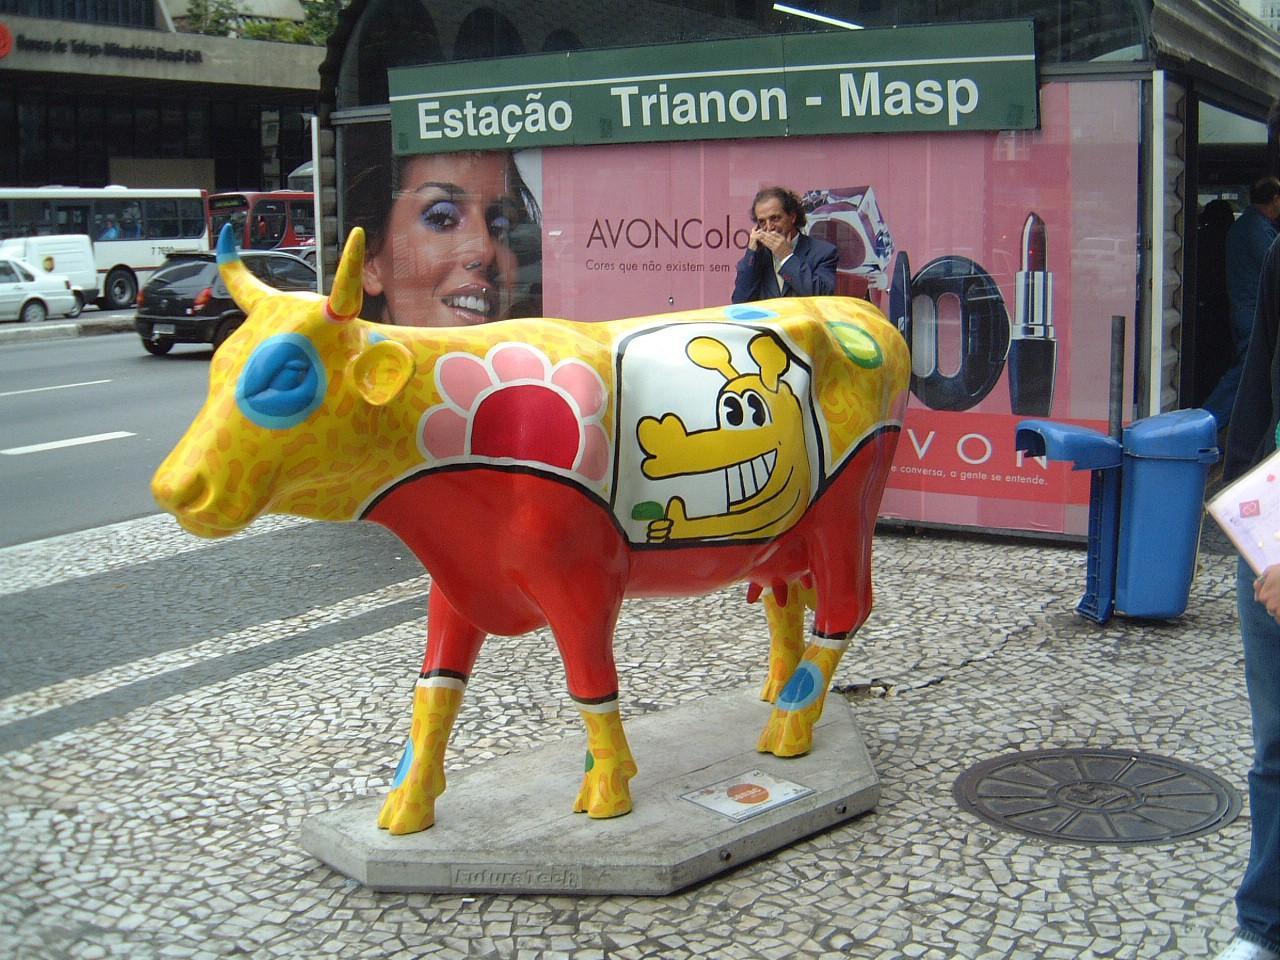 https://img.theculturetrip.com/wp-content/uploads/2017/03/cow-by-rui-amaral-photo-fabricio-zuardi.jpg